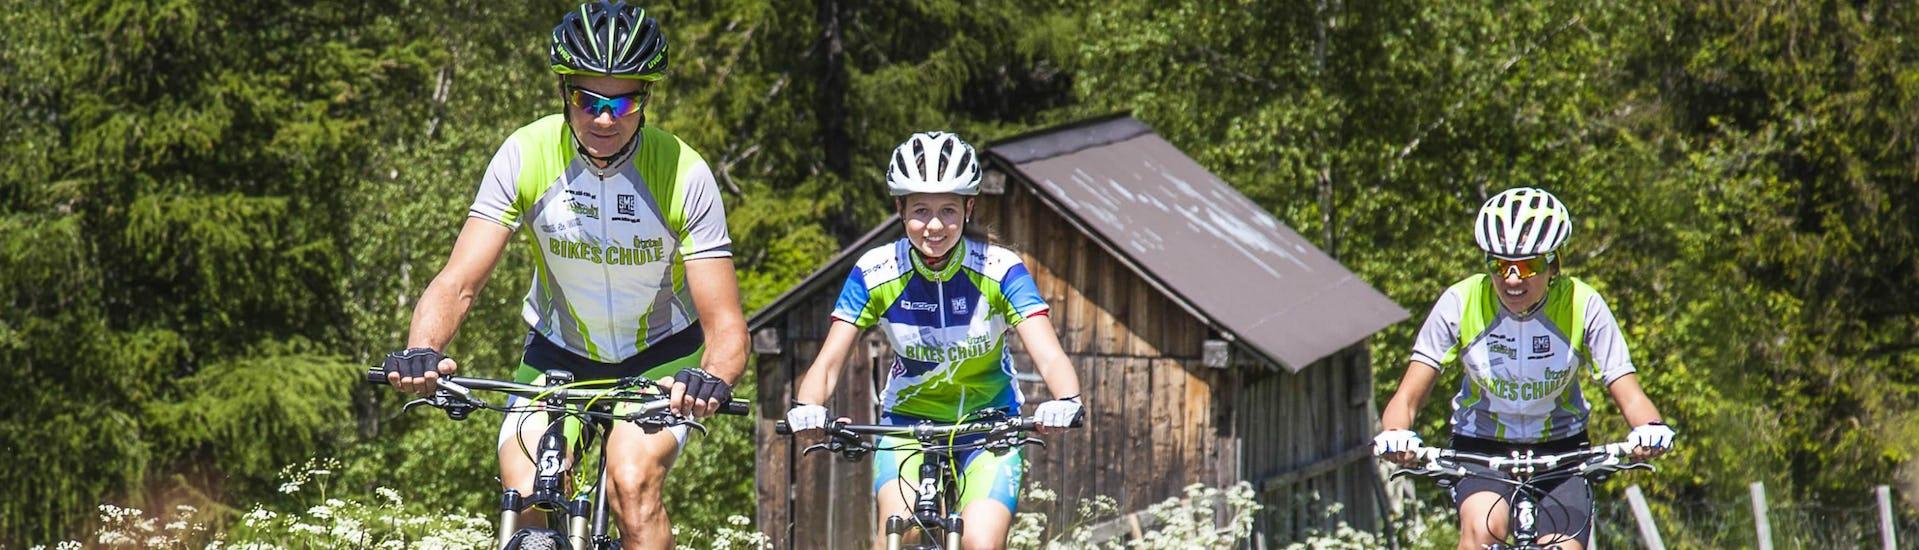 Mountain Bike Tour for Families - Beginner